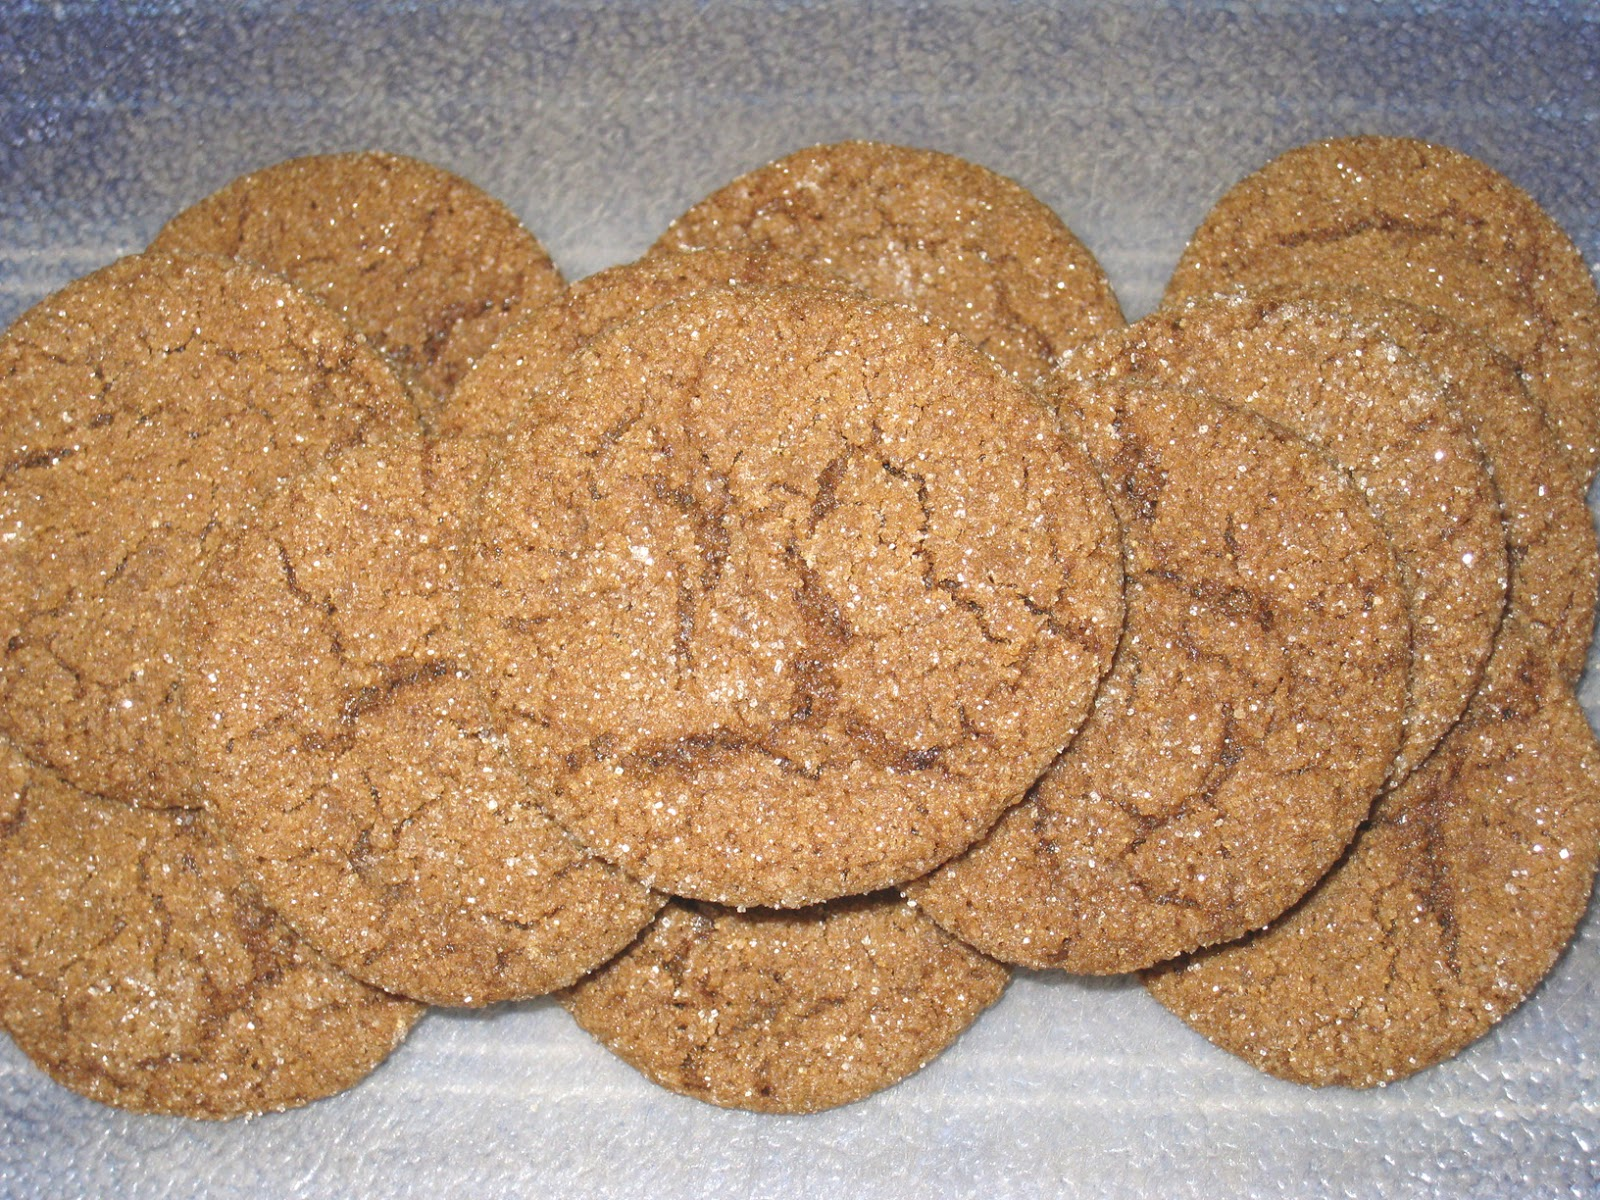 http://2.bp.blogspot.com/-rzMC2V8GRj8/UMU4NT-ZDwI/AAAAAAAAEkY/a0FYjl1HP54/s1600/121209+molasses+spice+cookies.jpg